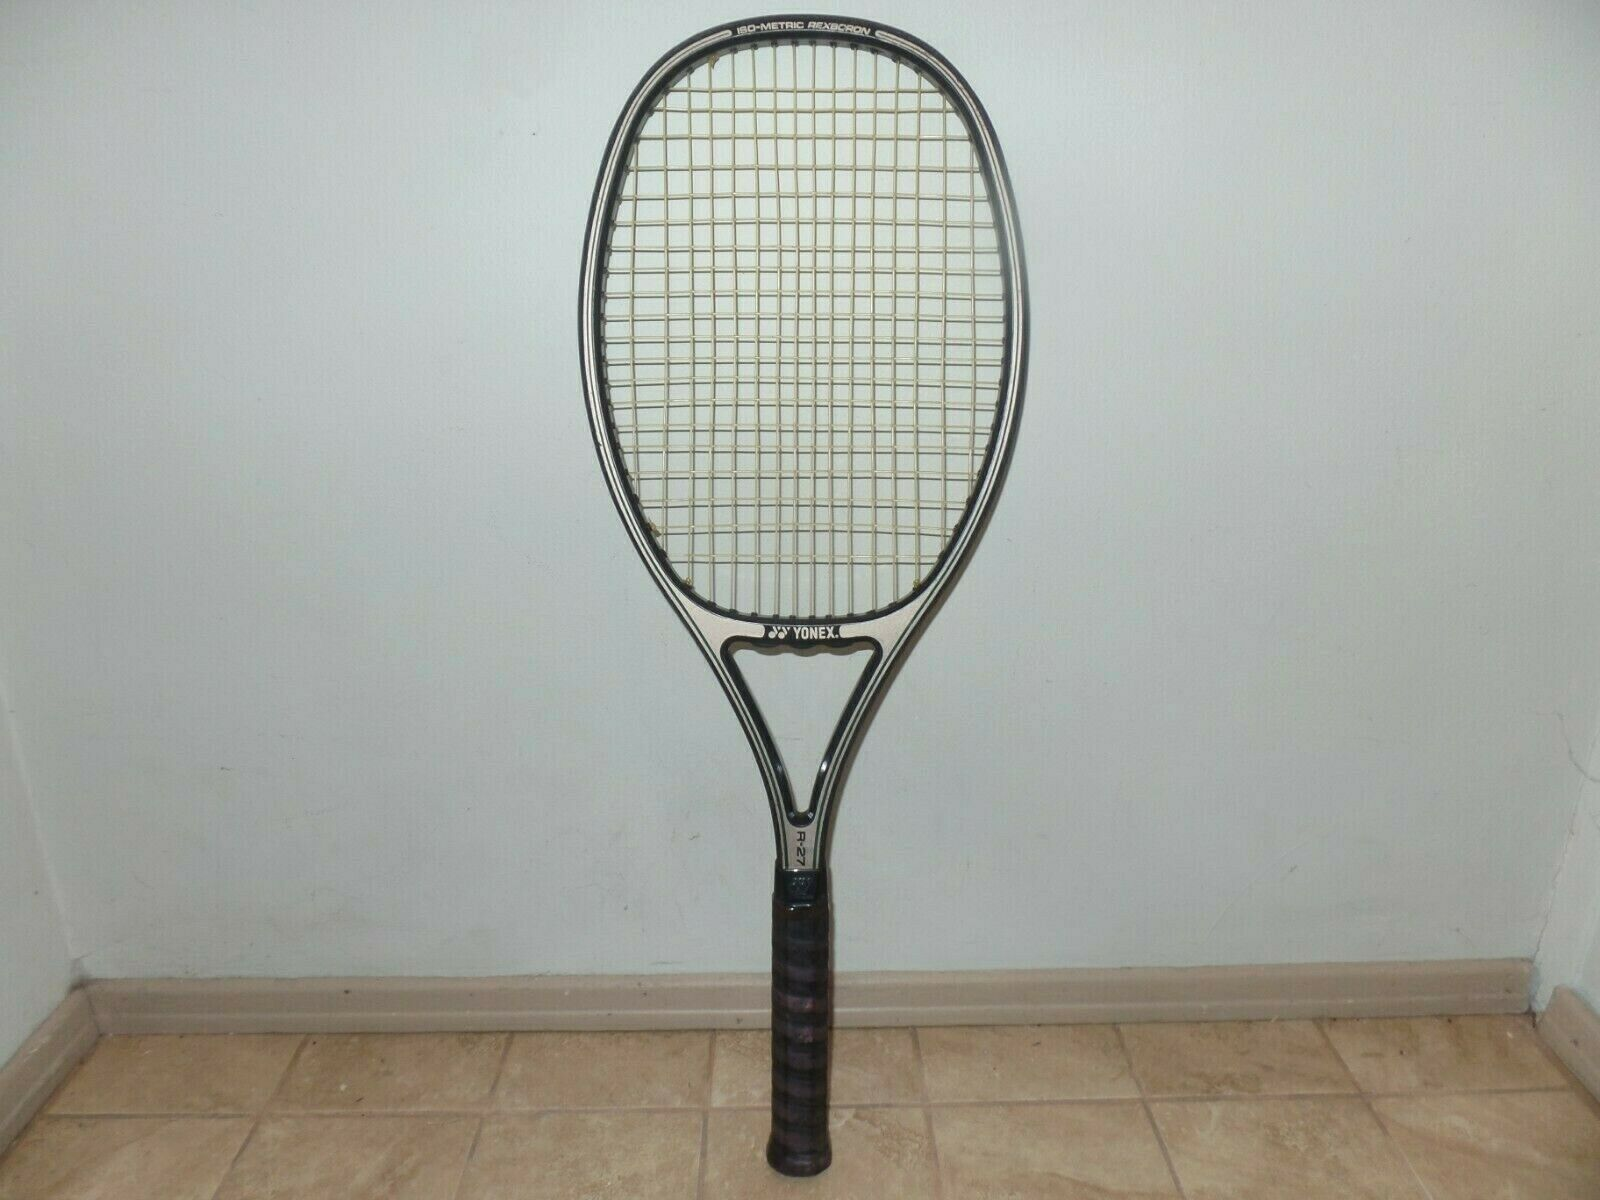 Yonex R-27 Iso Metric Rexbgoldn Mid Size Tennis Racquet